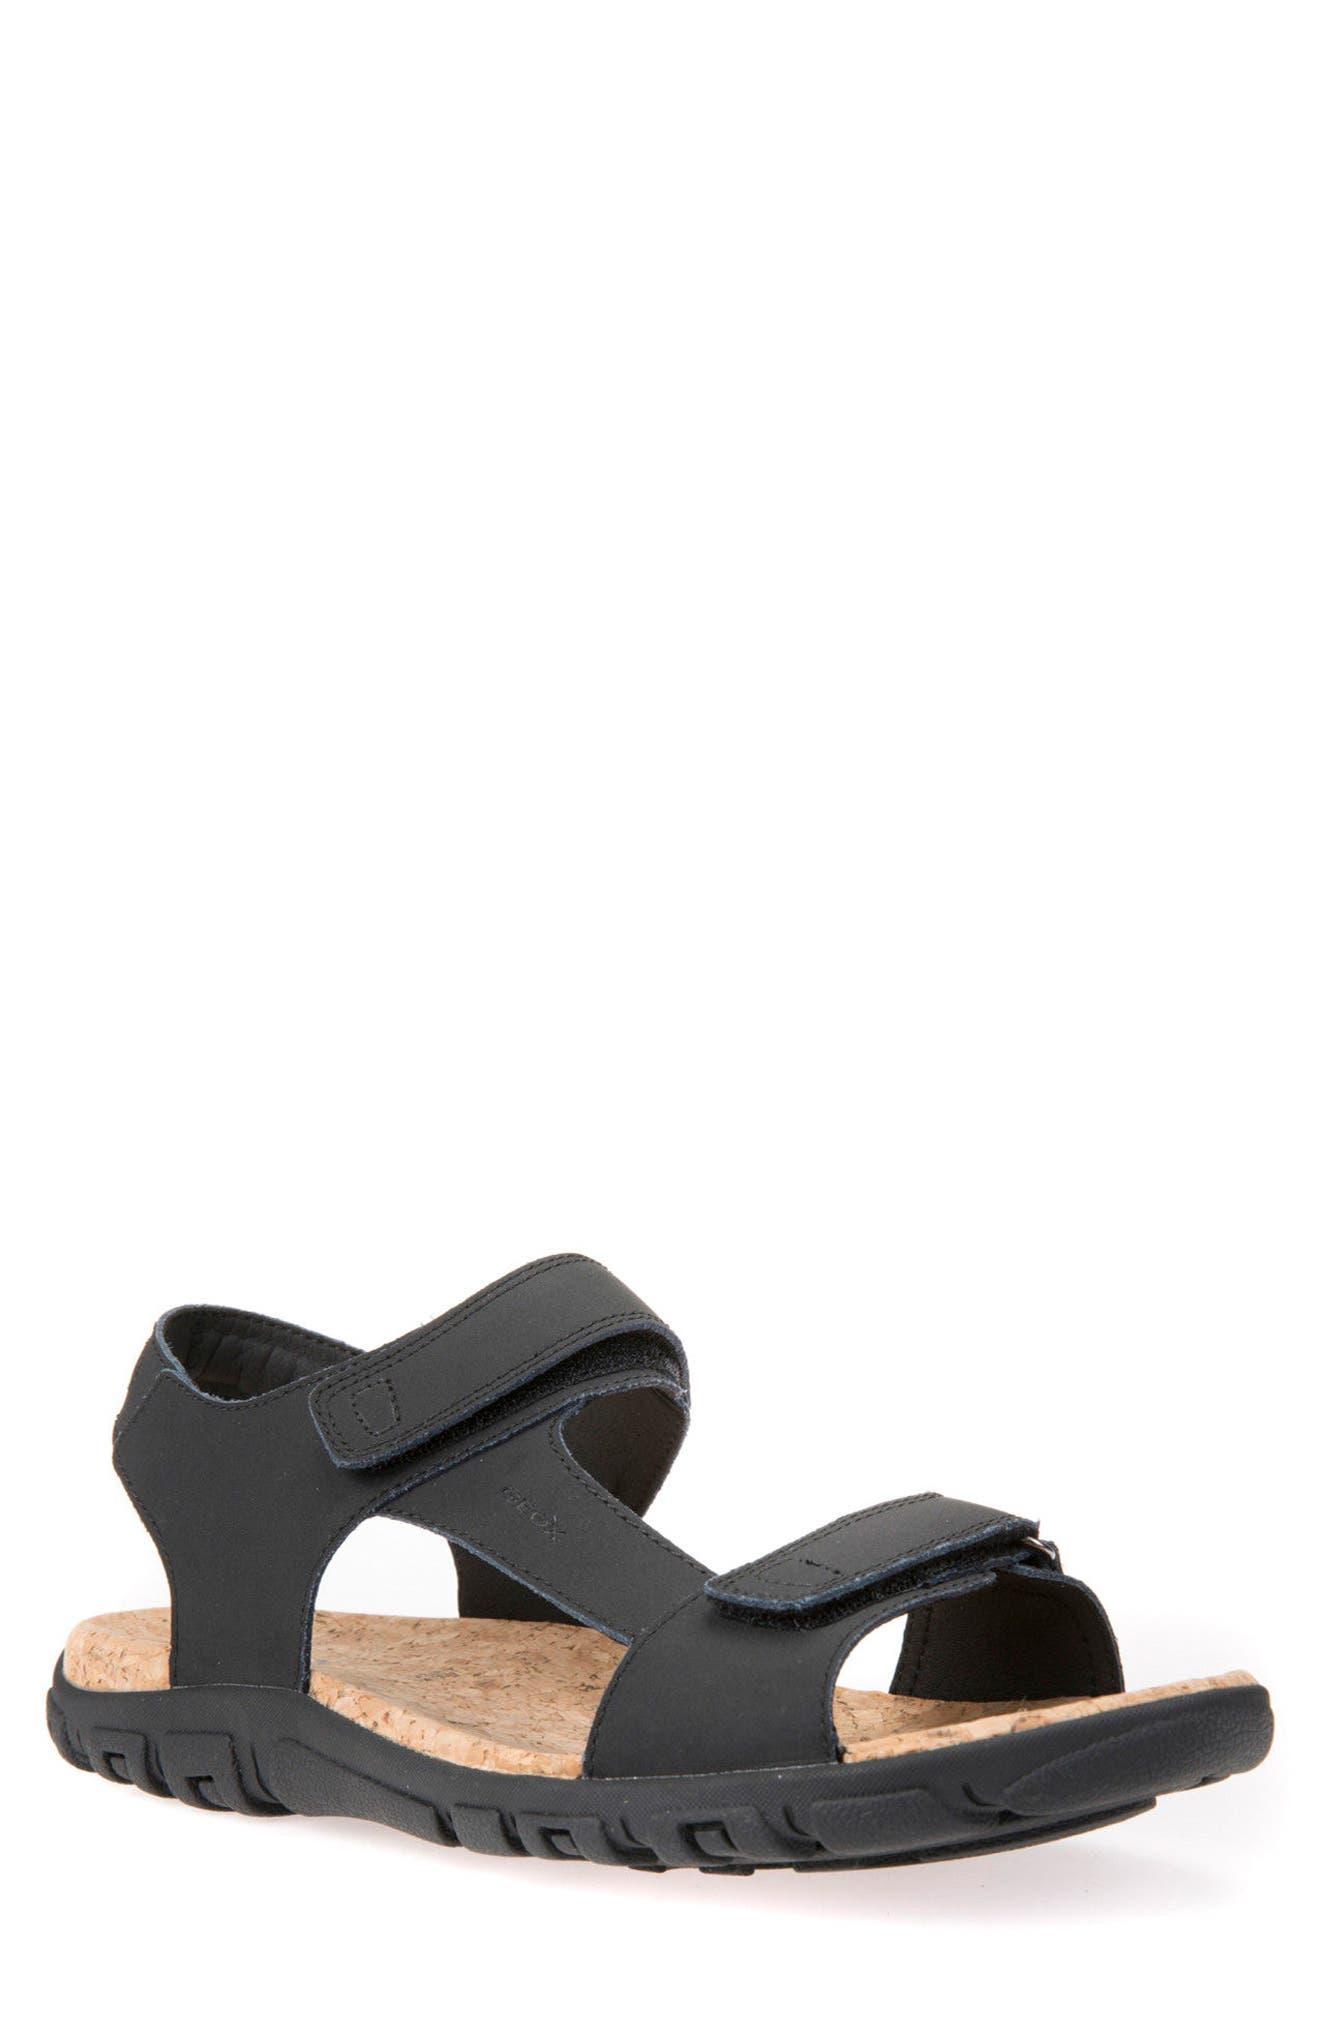 Strada 26 Sport Sandal,                             Main thumbnail 1, color,                             Black Leather